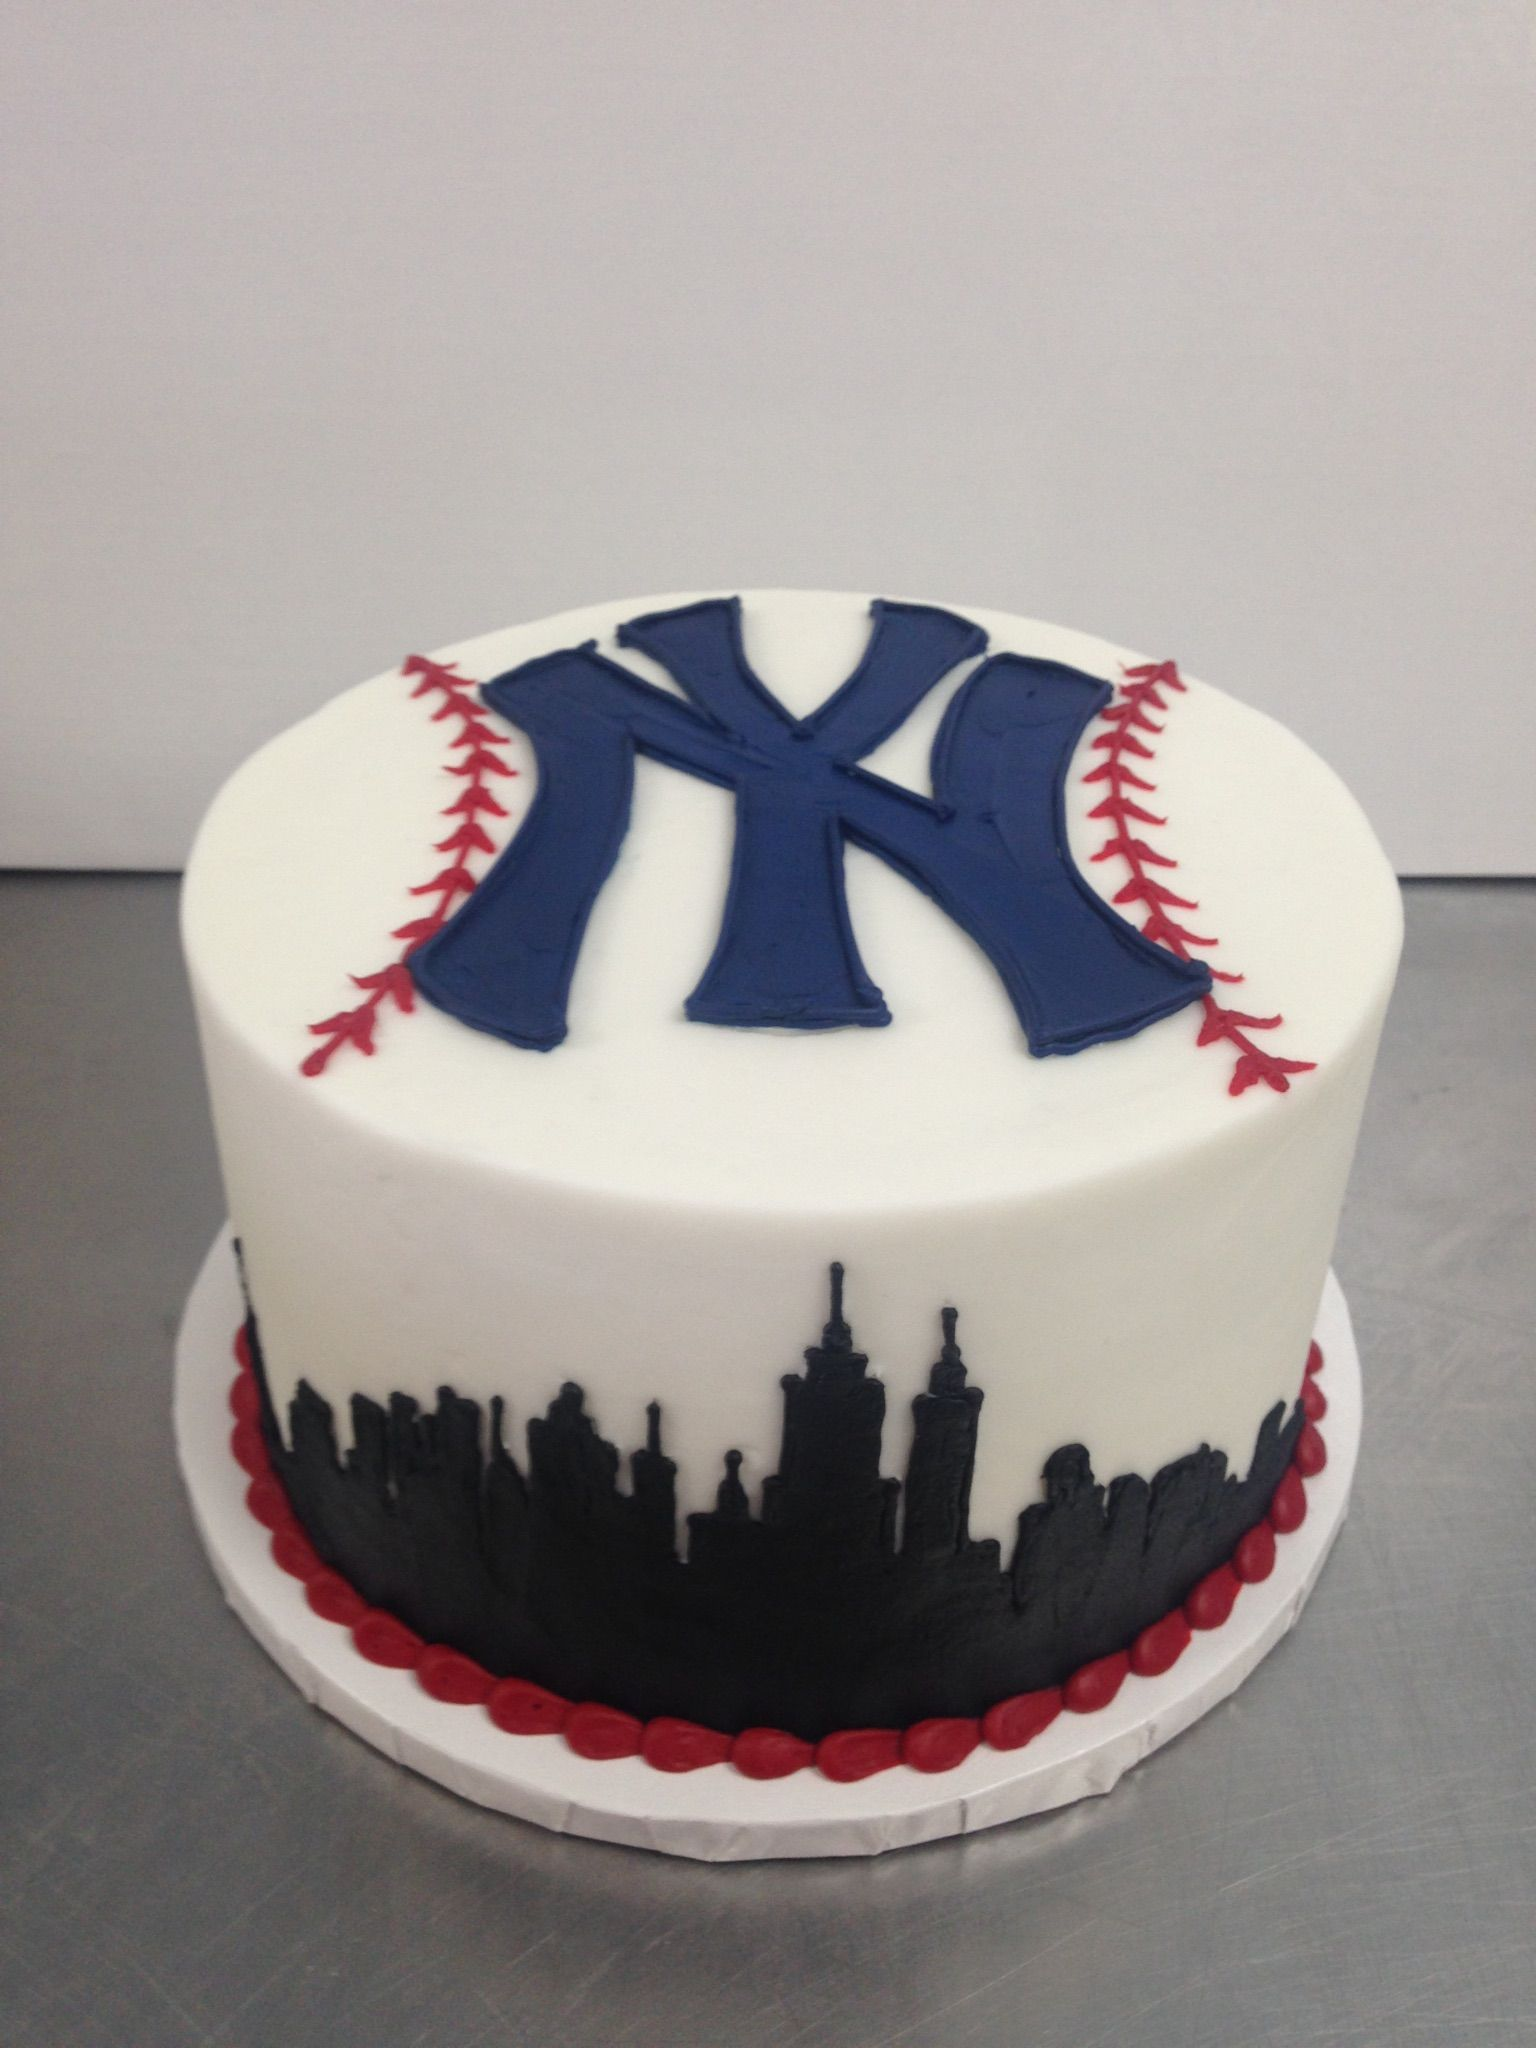 Yankee Groom S Cake Grooms Cake Yankee Cake Yankee Baseball Cake